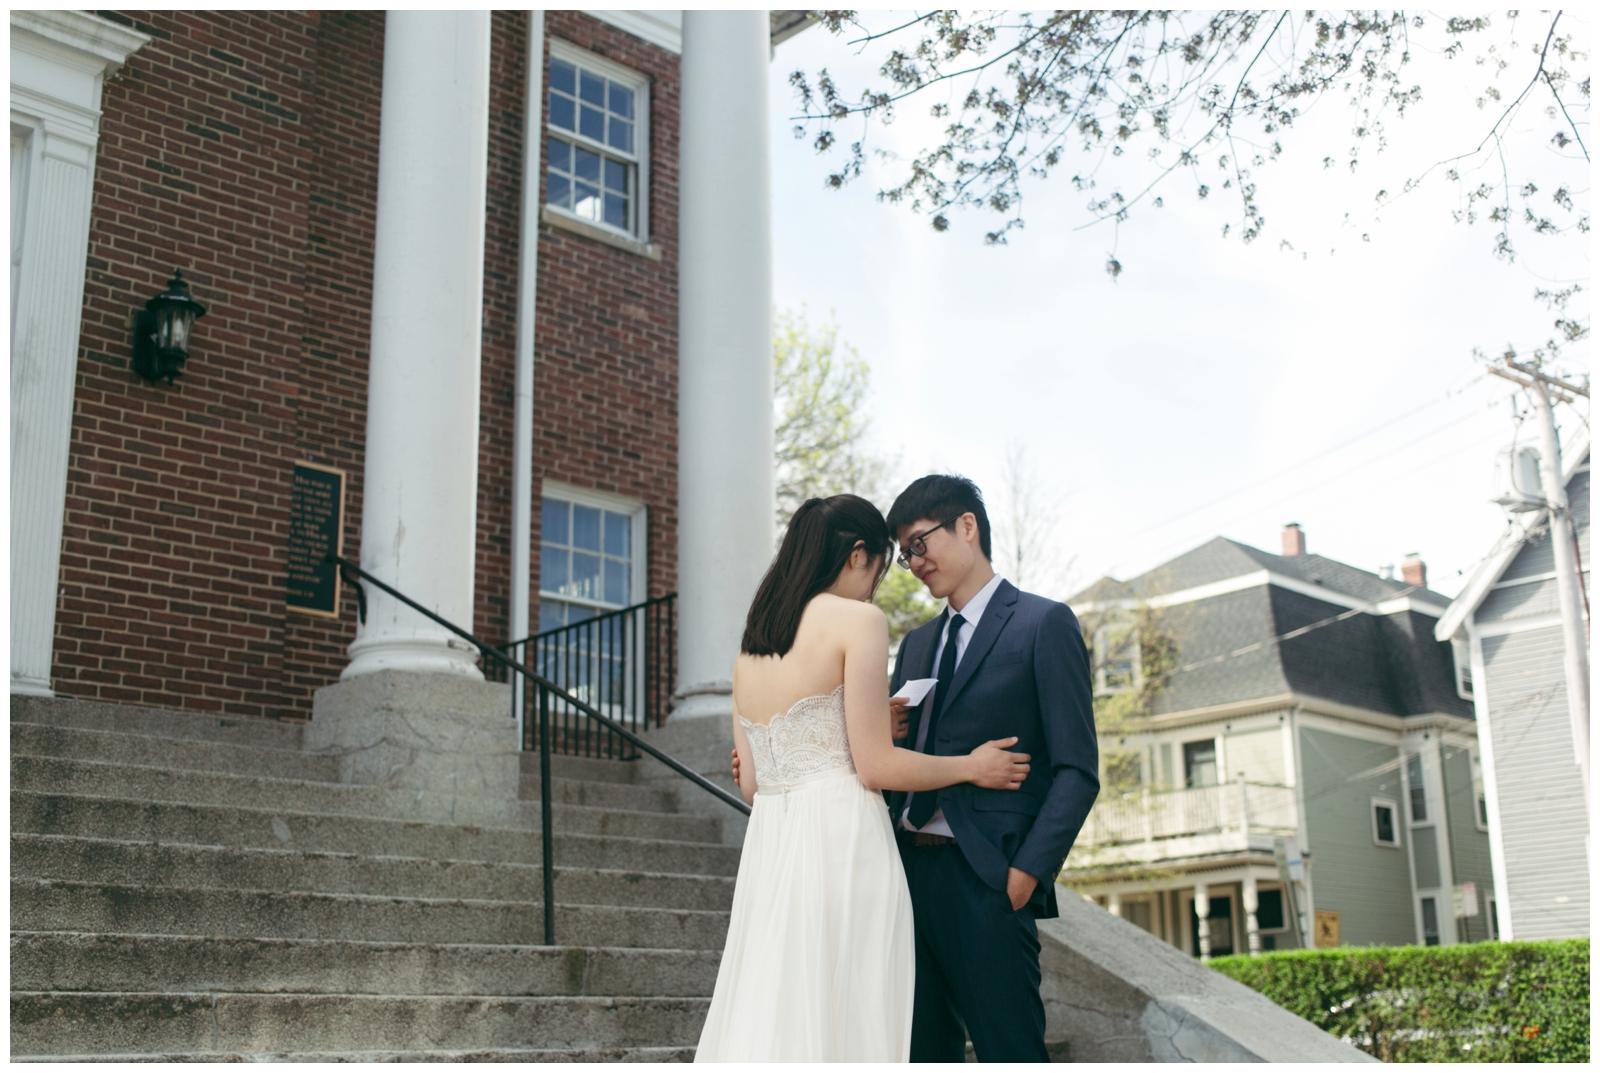 Samberg-Conference-Center-Boston-Wedding-Photographer-Bailey-Q-Photo-030.jpg